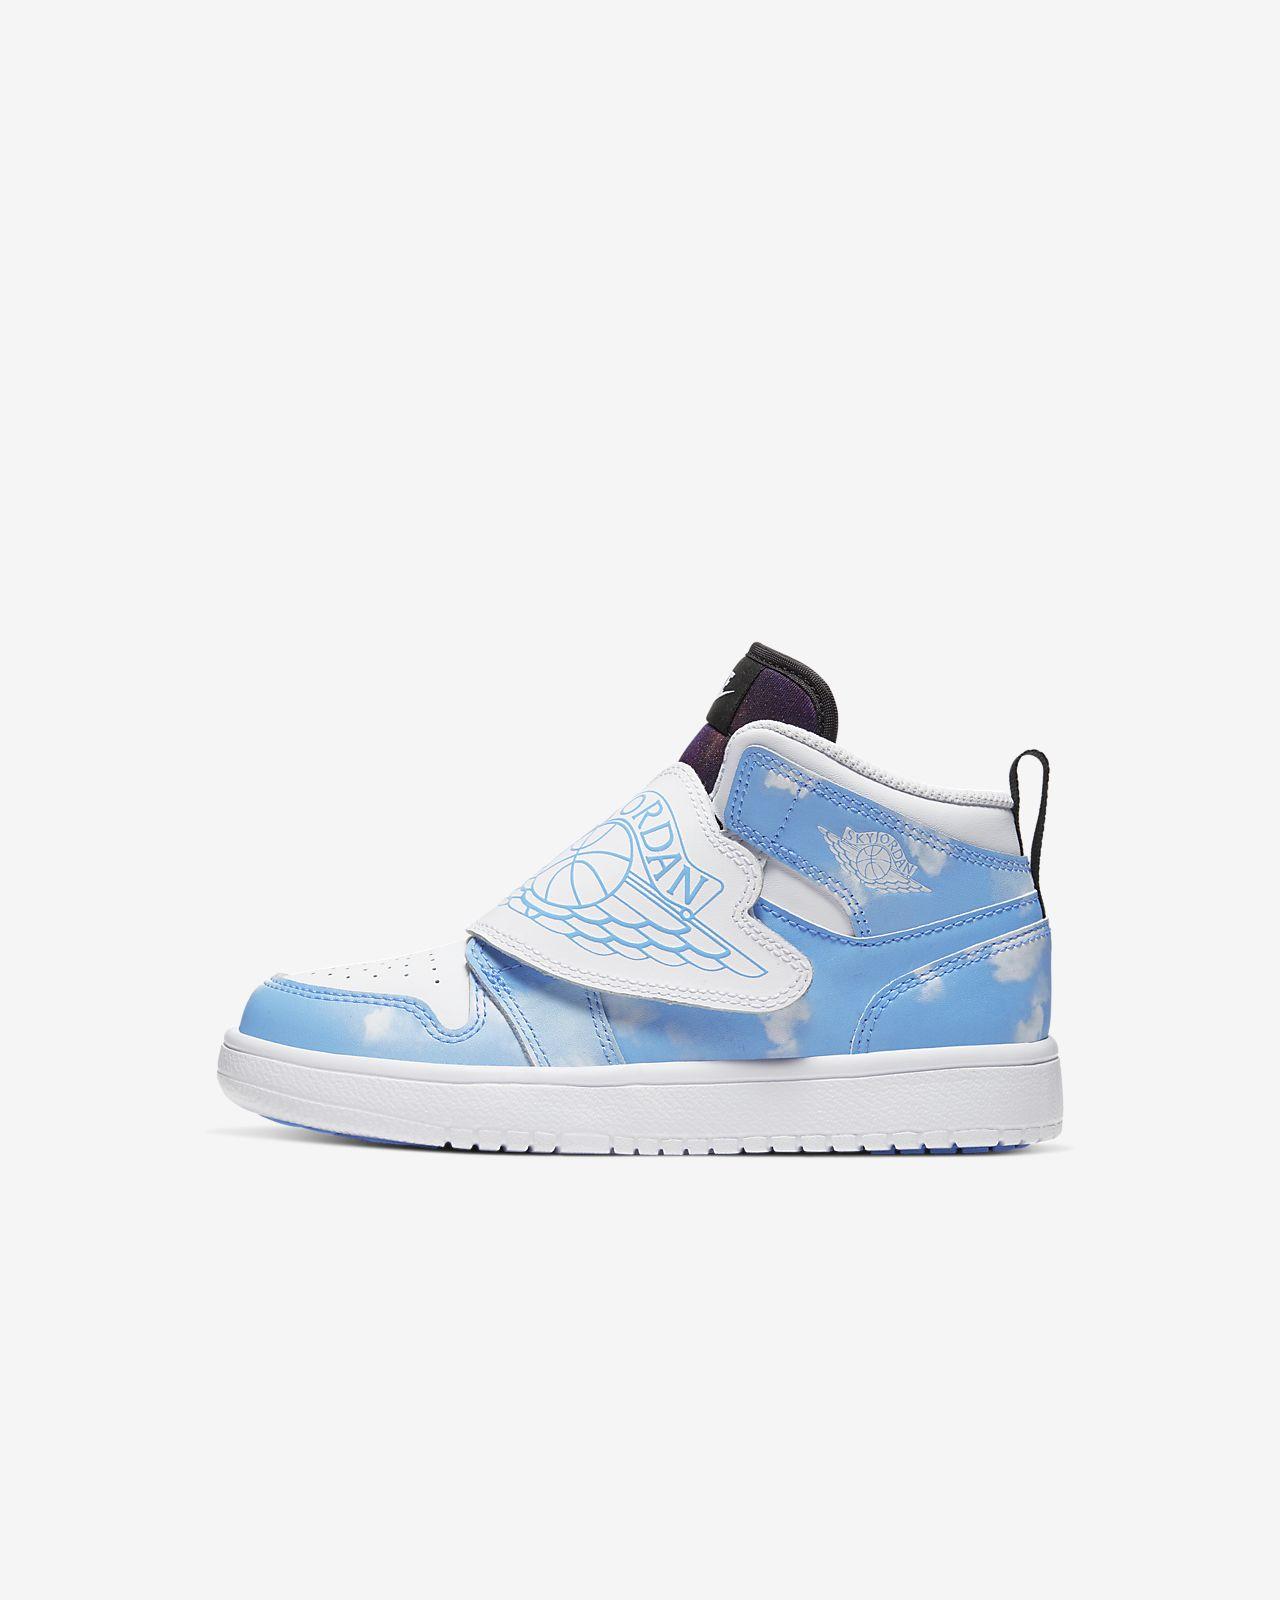 Sky Jordan 1 Fearless (PS) 幼童运动童鞋